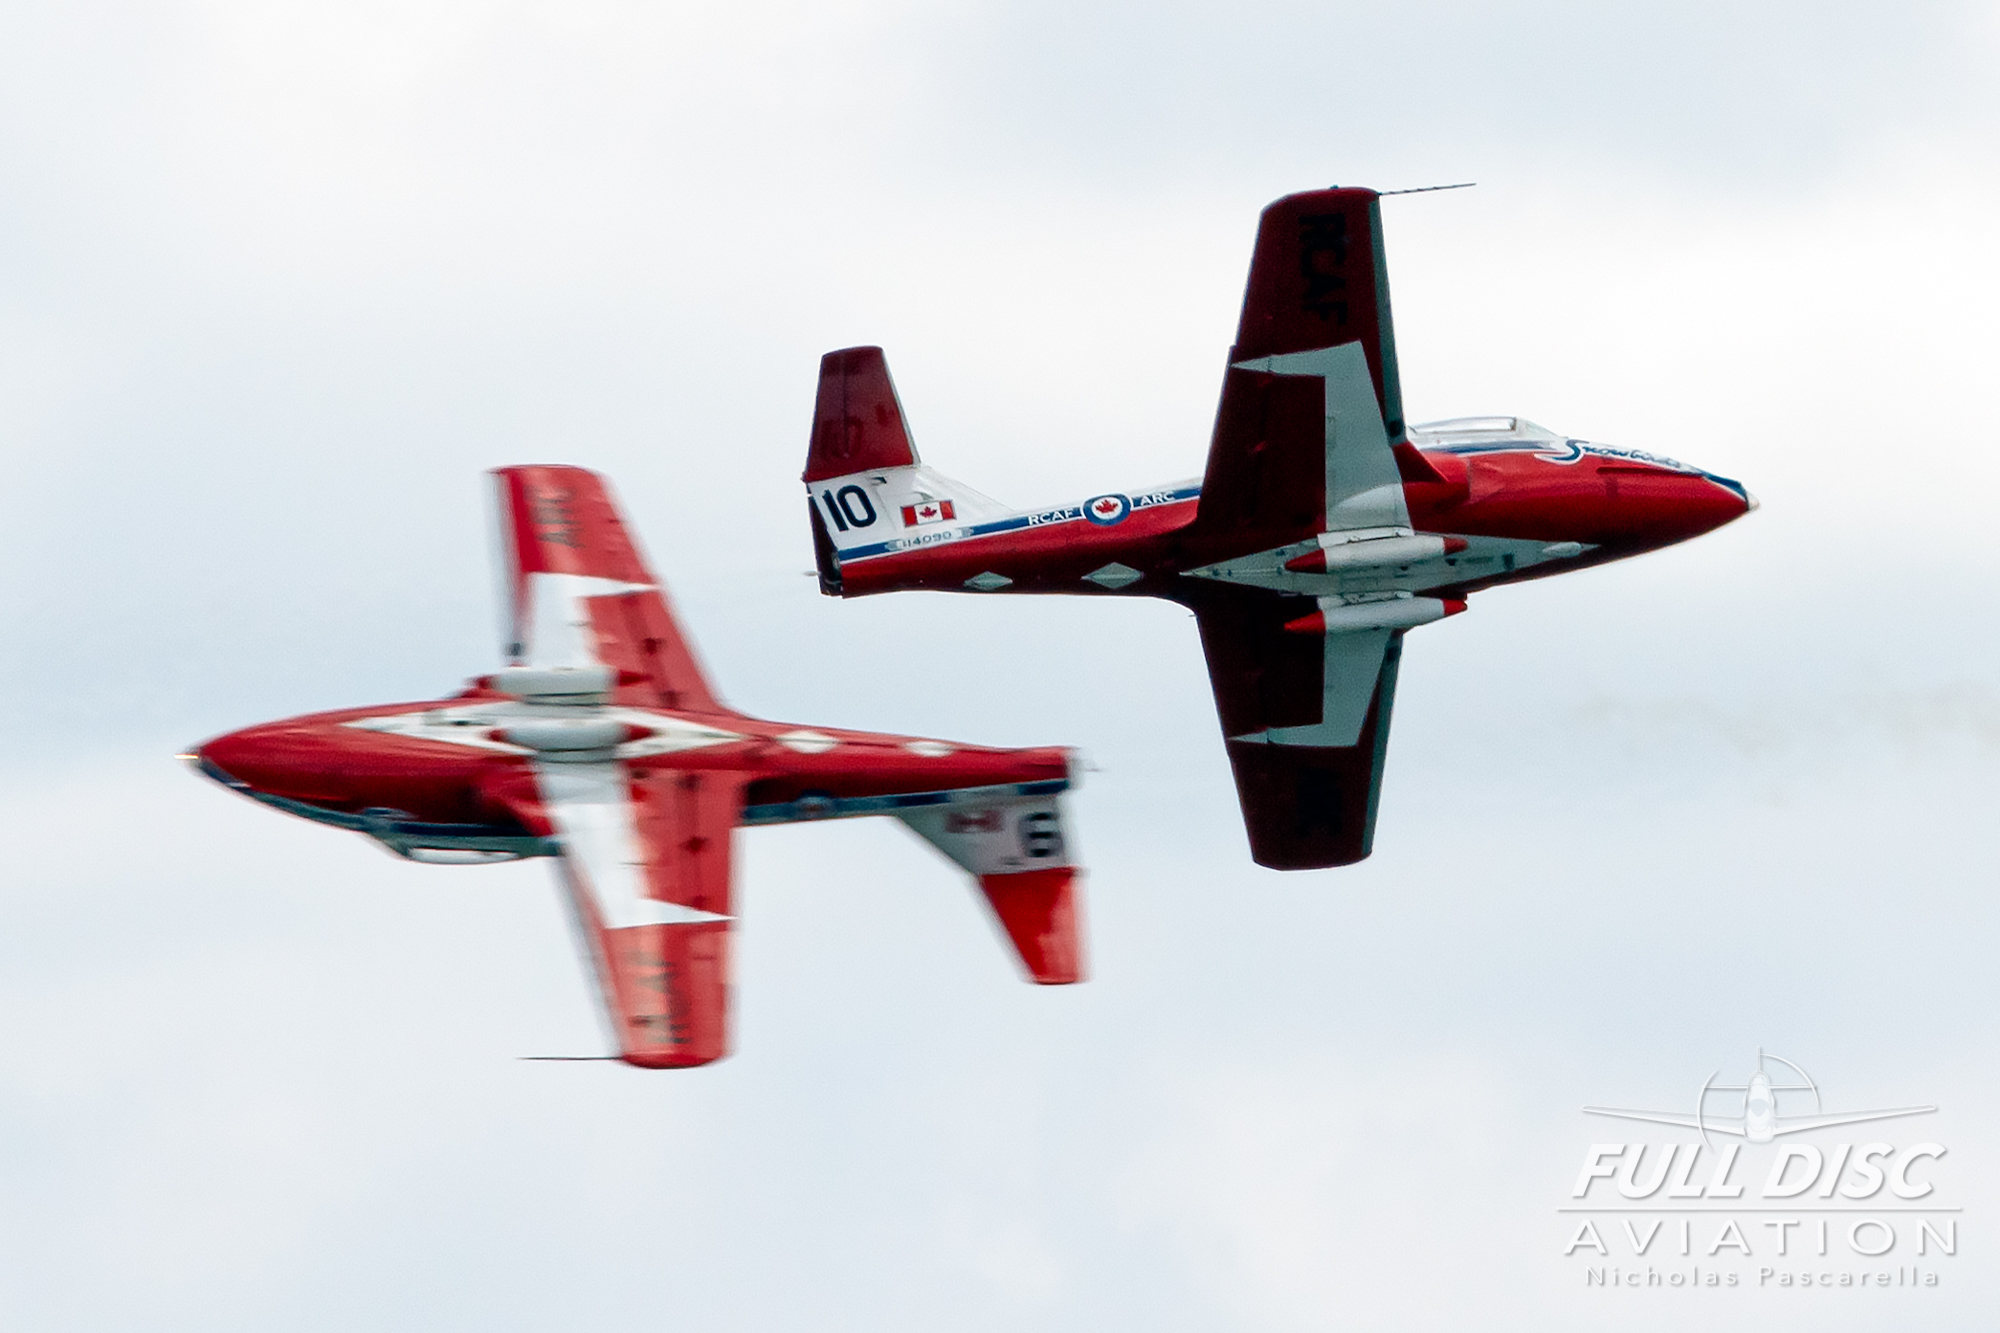 nickpascarella_fulldiscaviation_oceancityairshow_aviation_snowbirds_rollcross.jpg